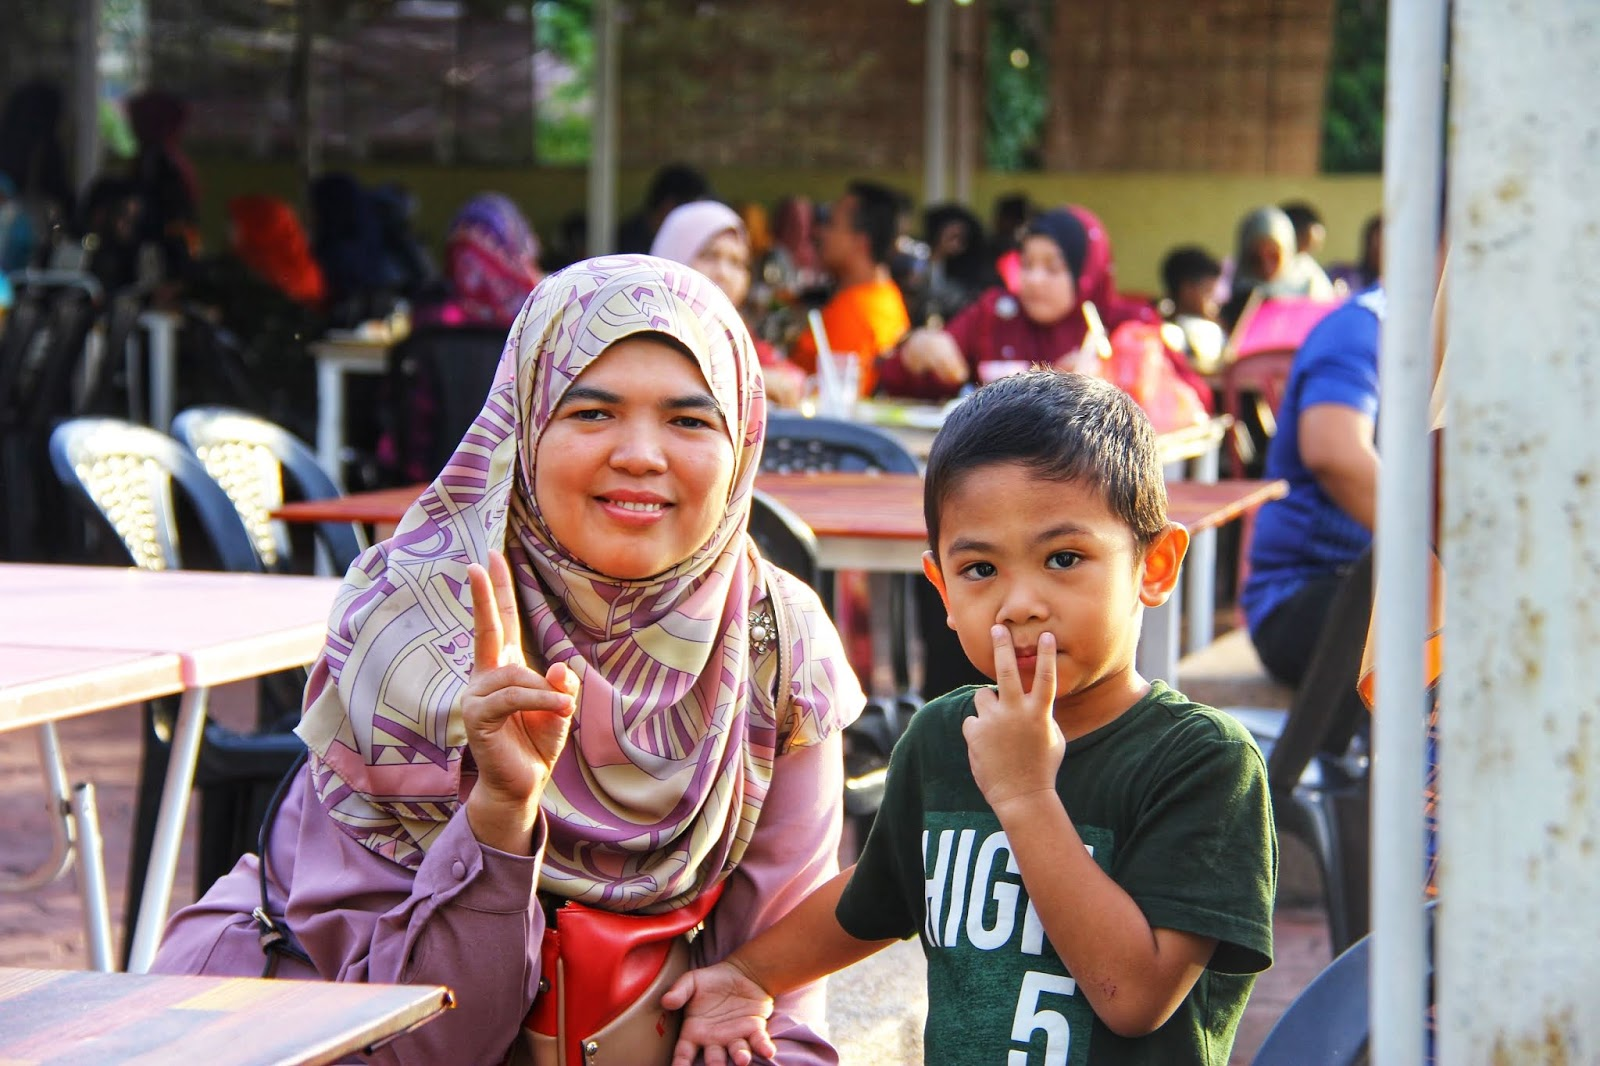 Hafiz & Ummi di Restoran Api-api Ikan Bakar Kuala Perlis